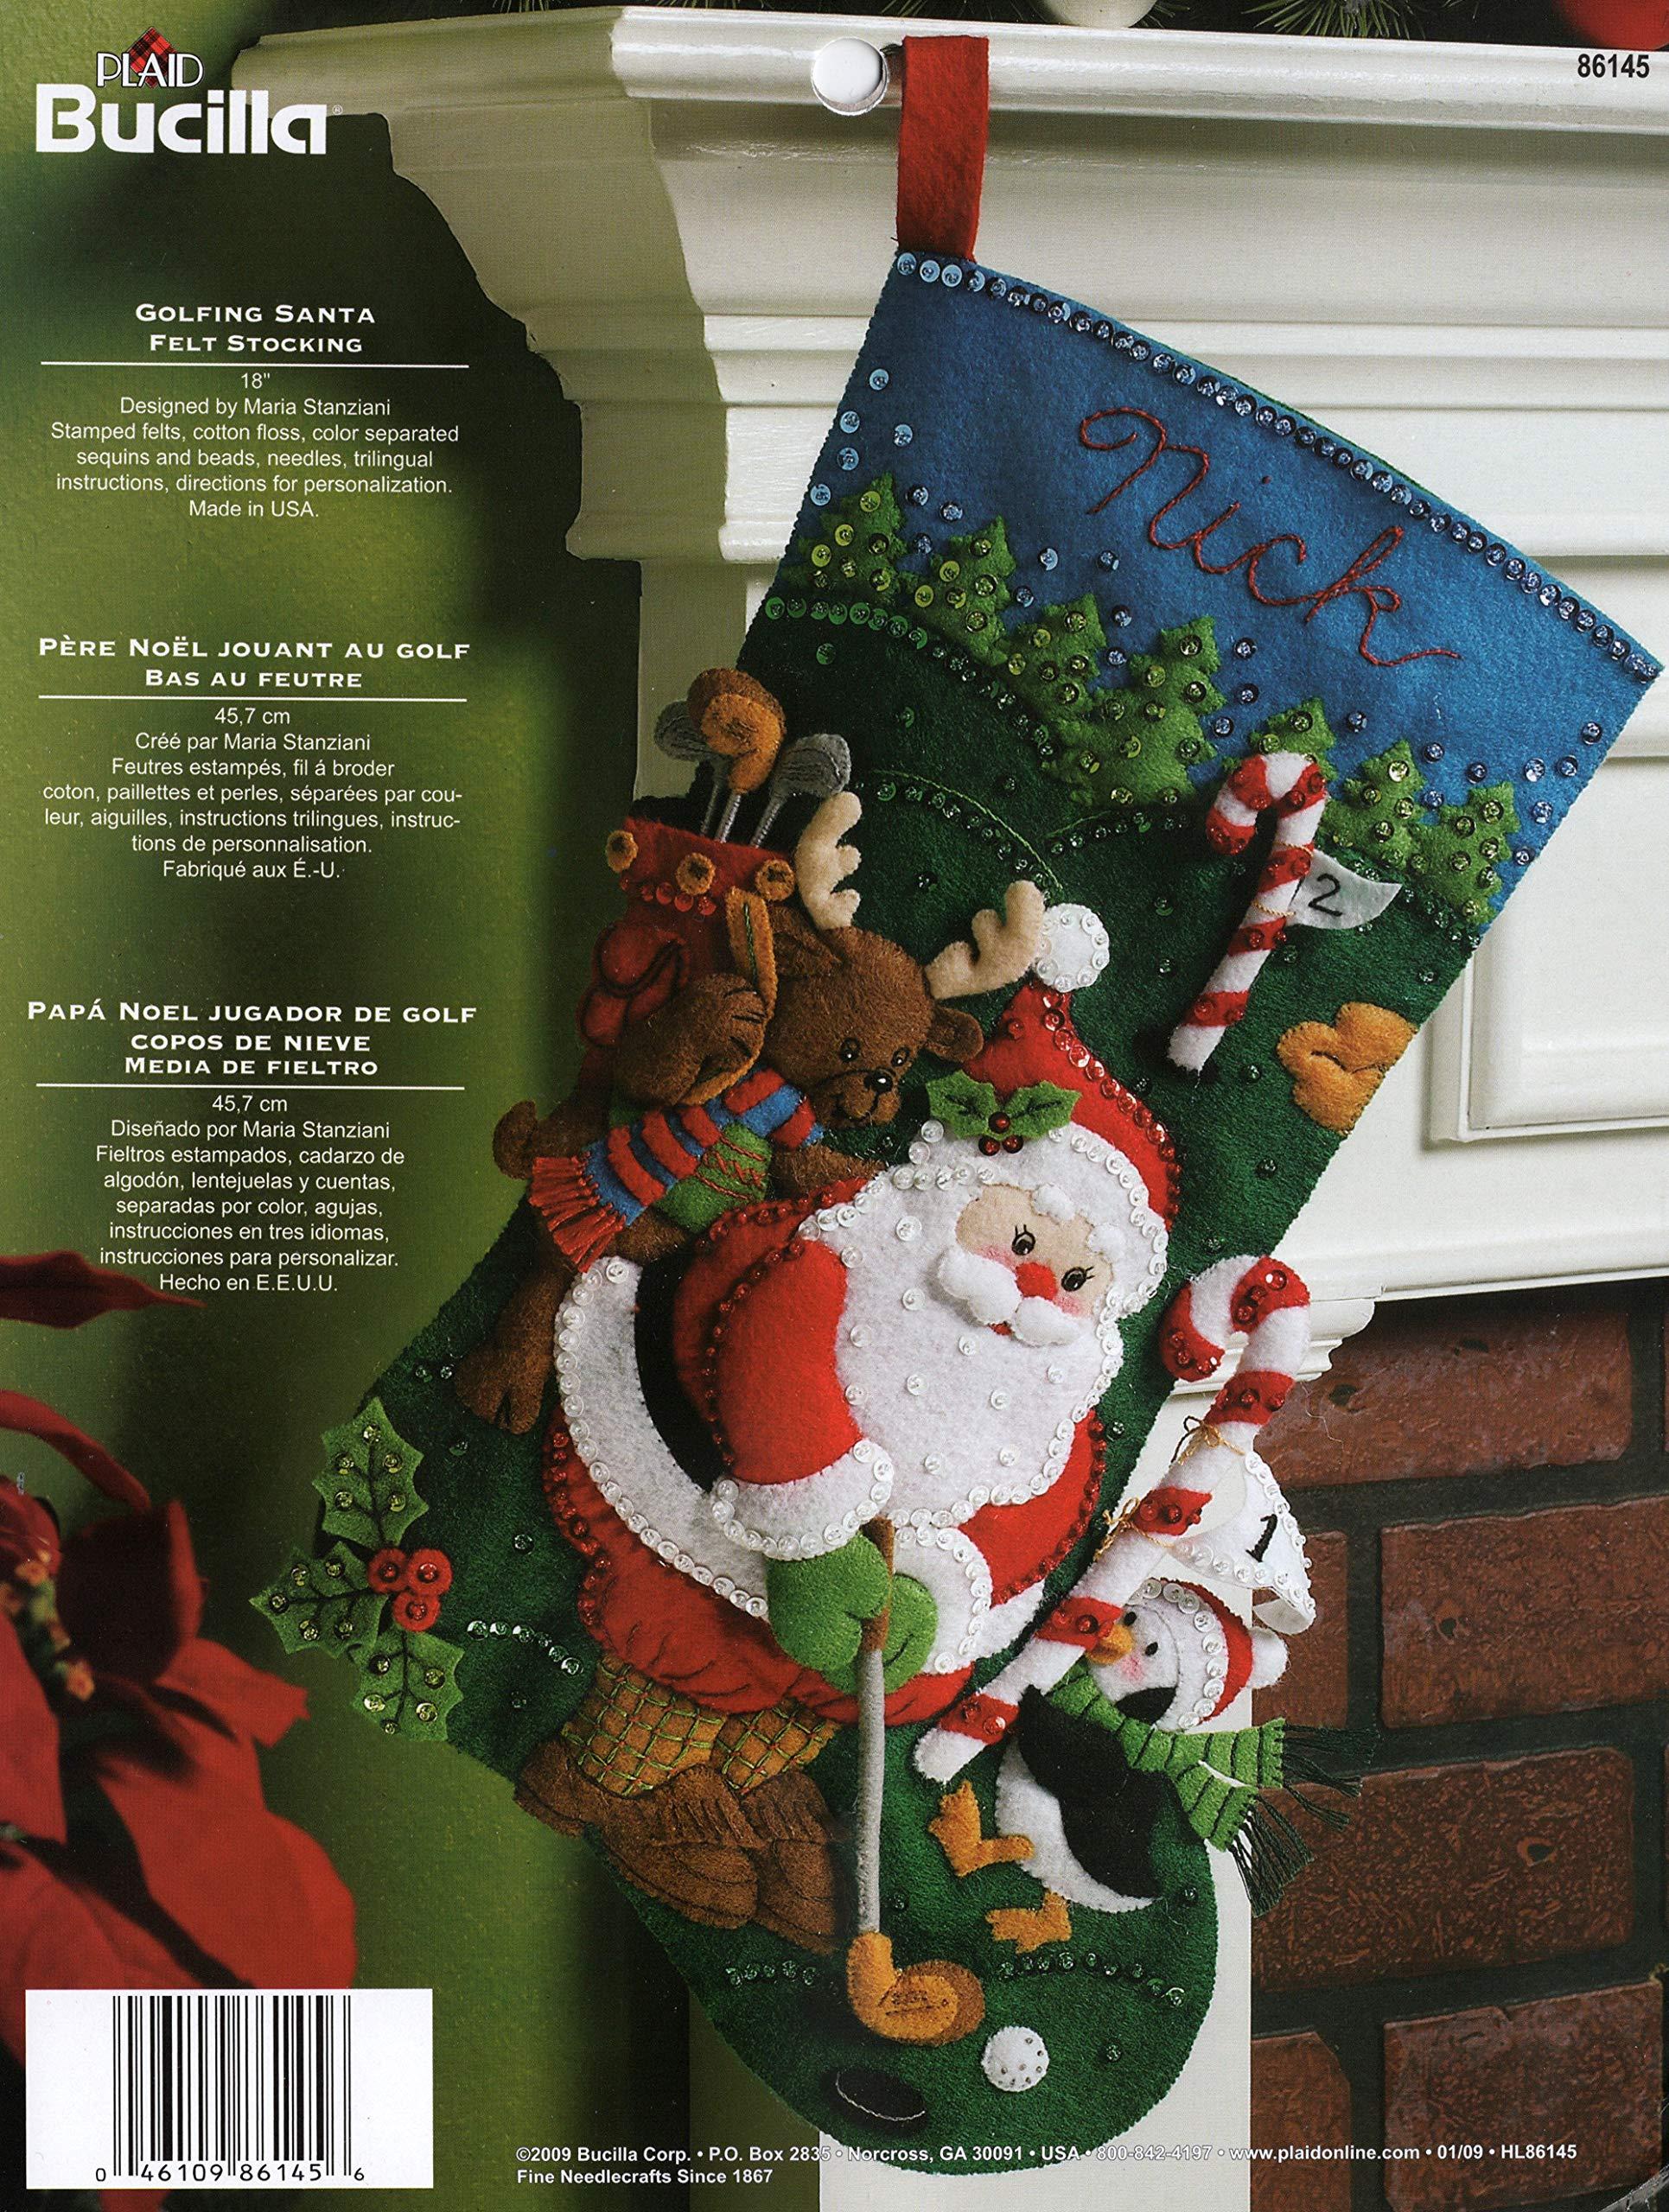 Bucilla 18-Inch Christmas Stocking Felt Applique Kit, 86145 Golfing Santa by Bucilla